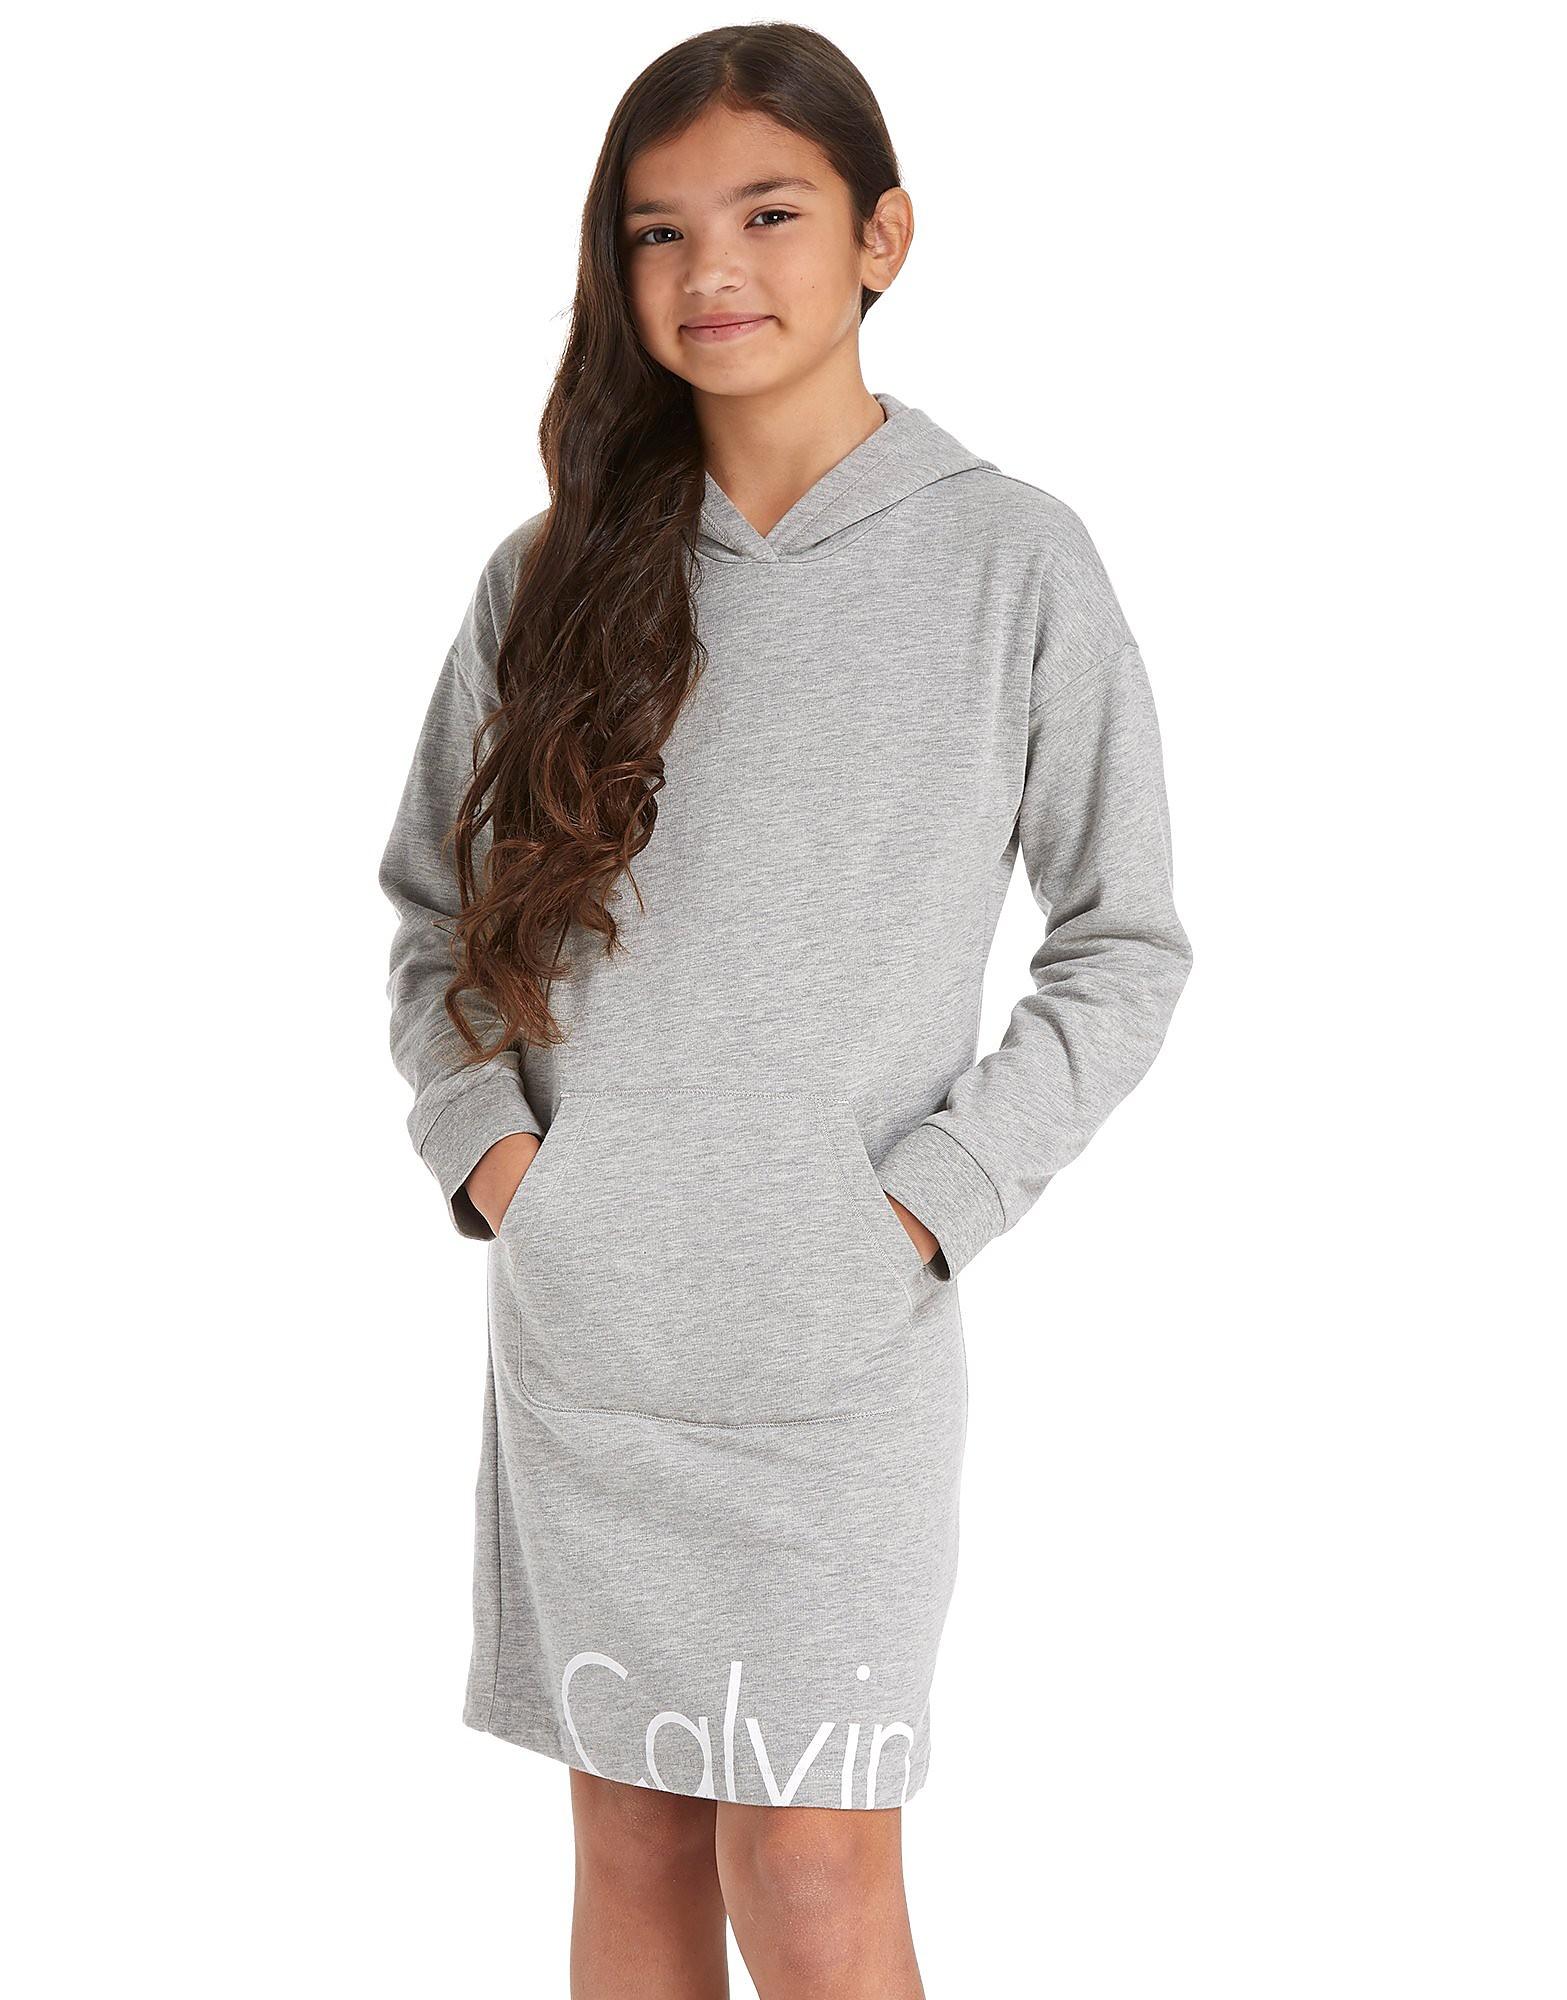 Calvin Klein Girls' Hooded Dress Junior